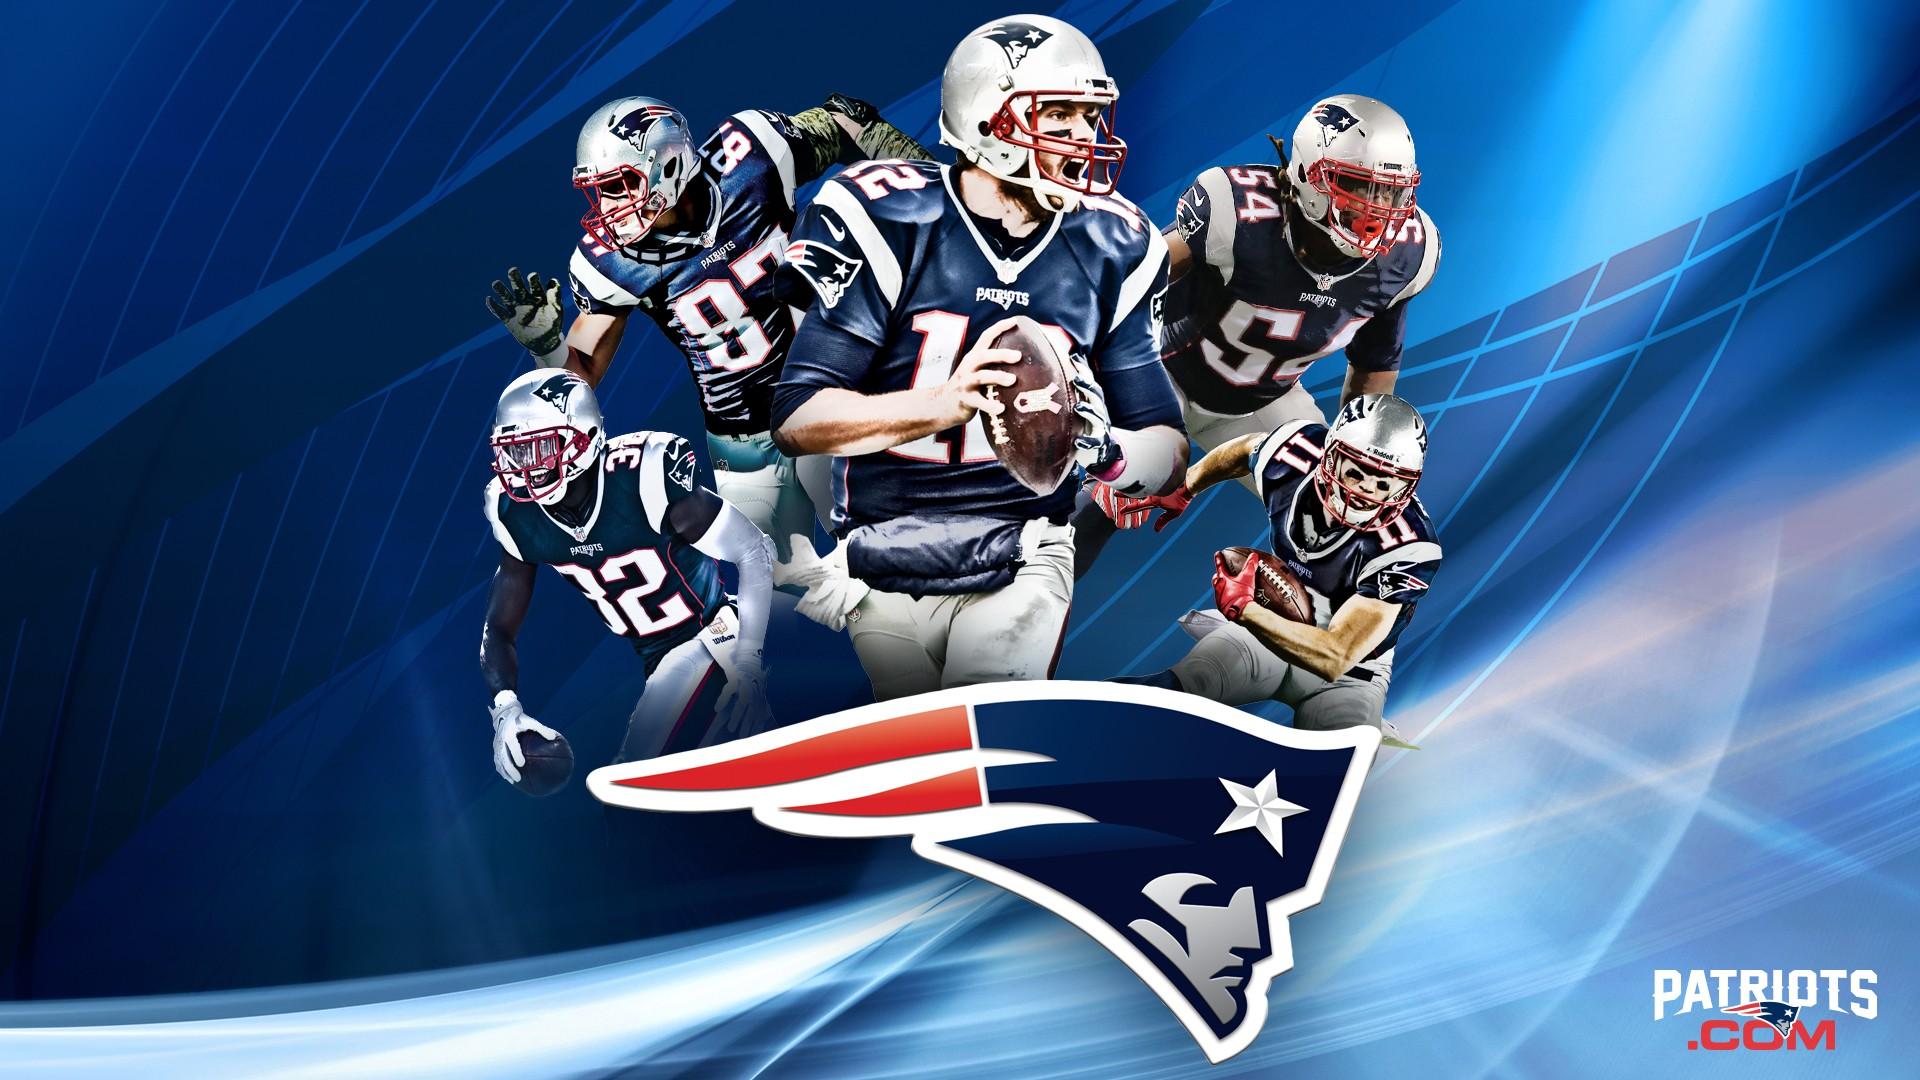 New England Patriots For Desktop Wallpaper With Resolution - New England Patriots Wallpaper 2019 - HD Wallpaper